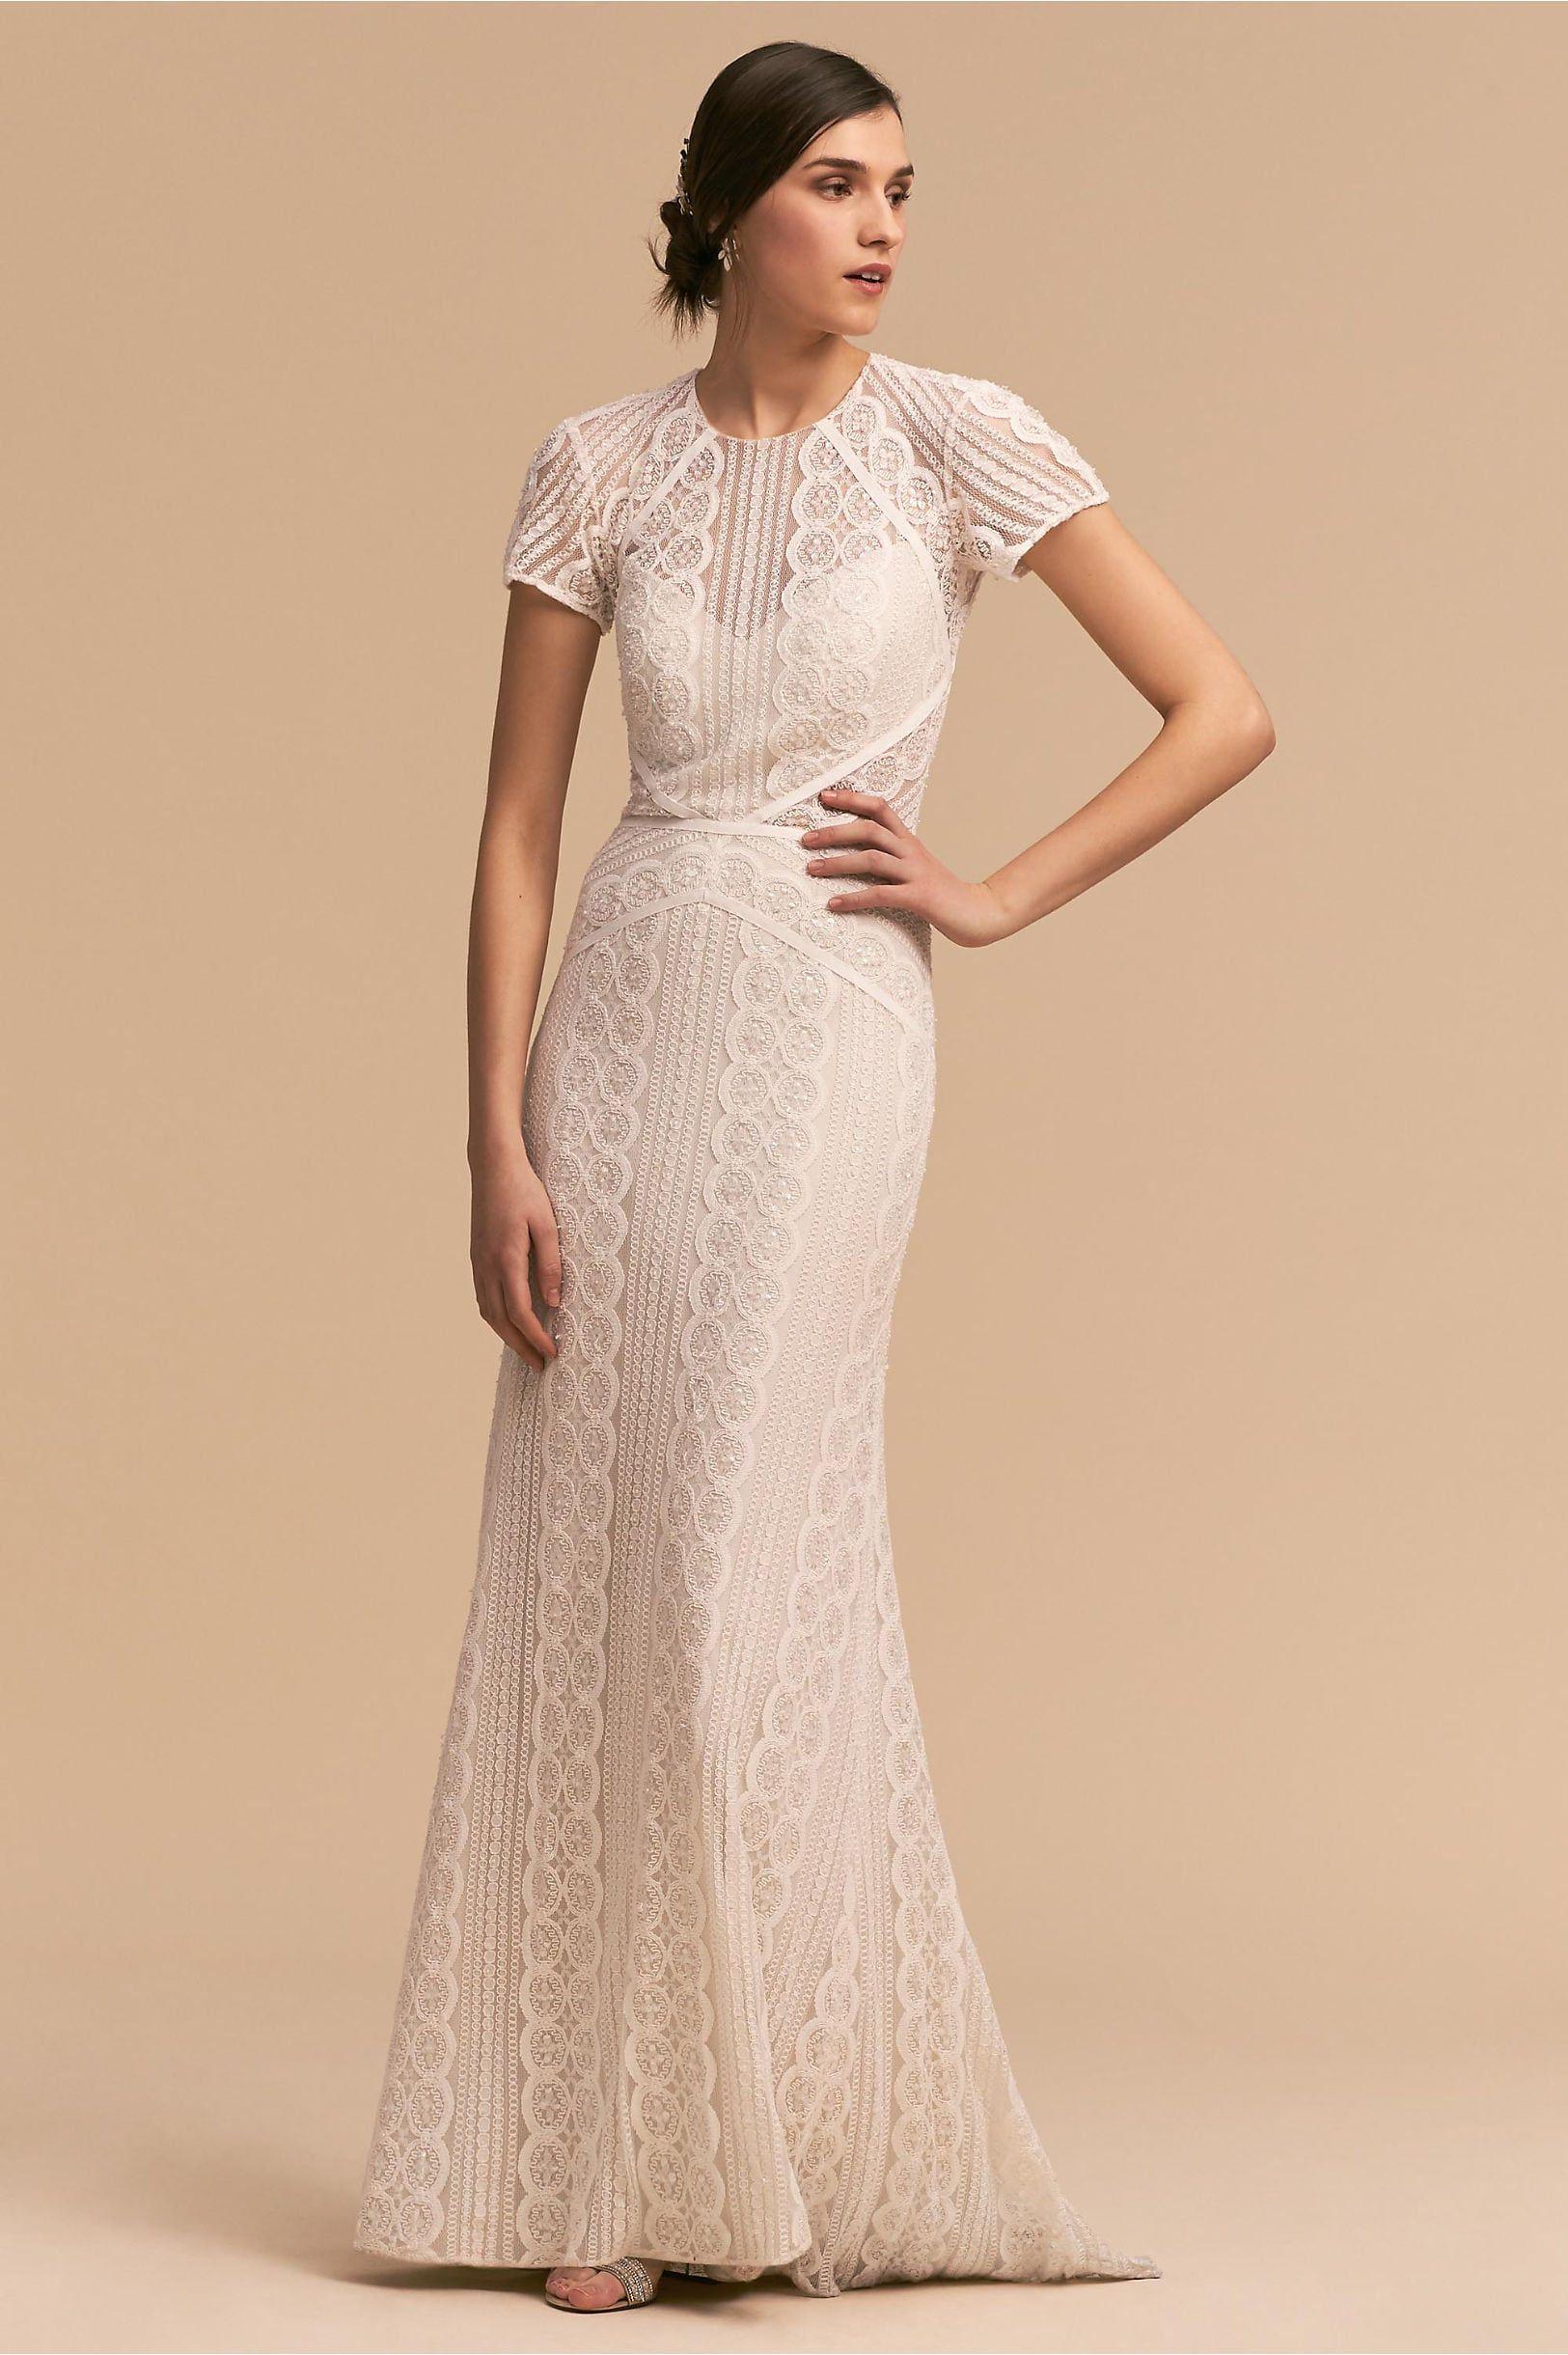 80 Stylish Beach Wedding Dresses A Practical Wedding Bhldn Wedding Dress Perfect Wedding Dress Expensive Wedding Dress